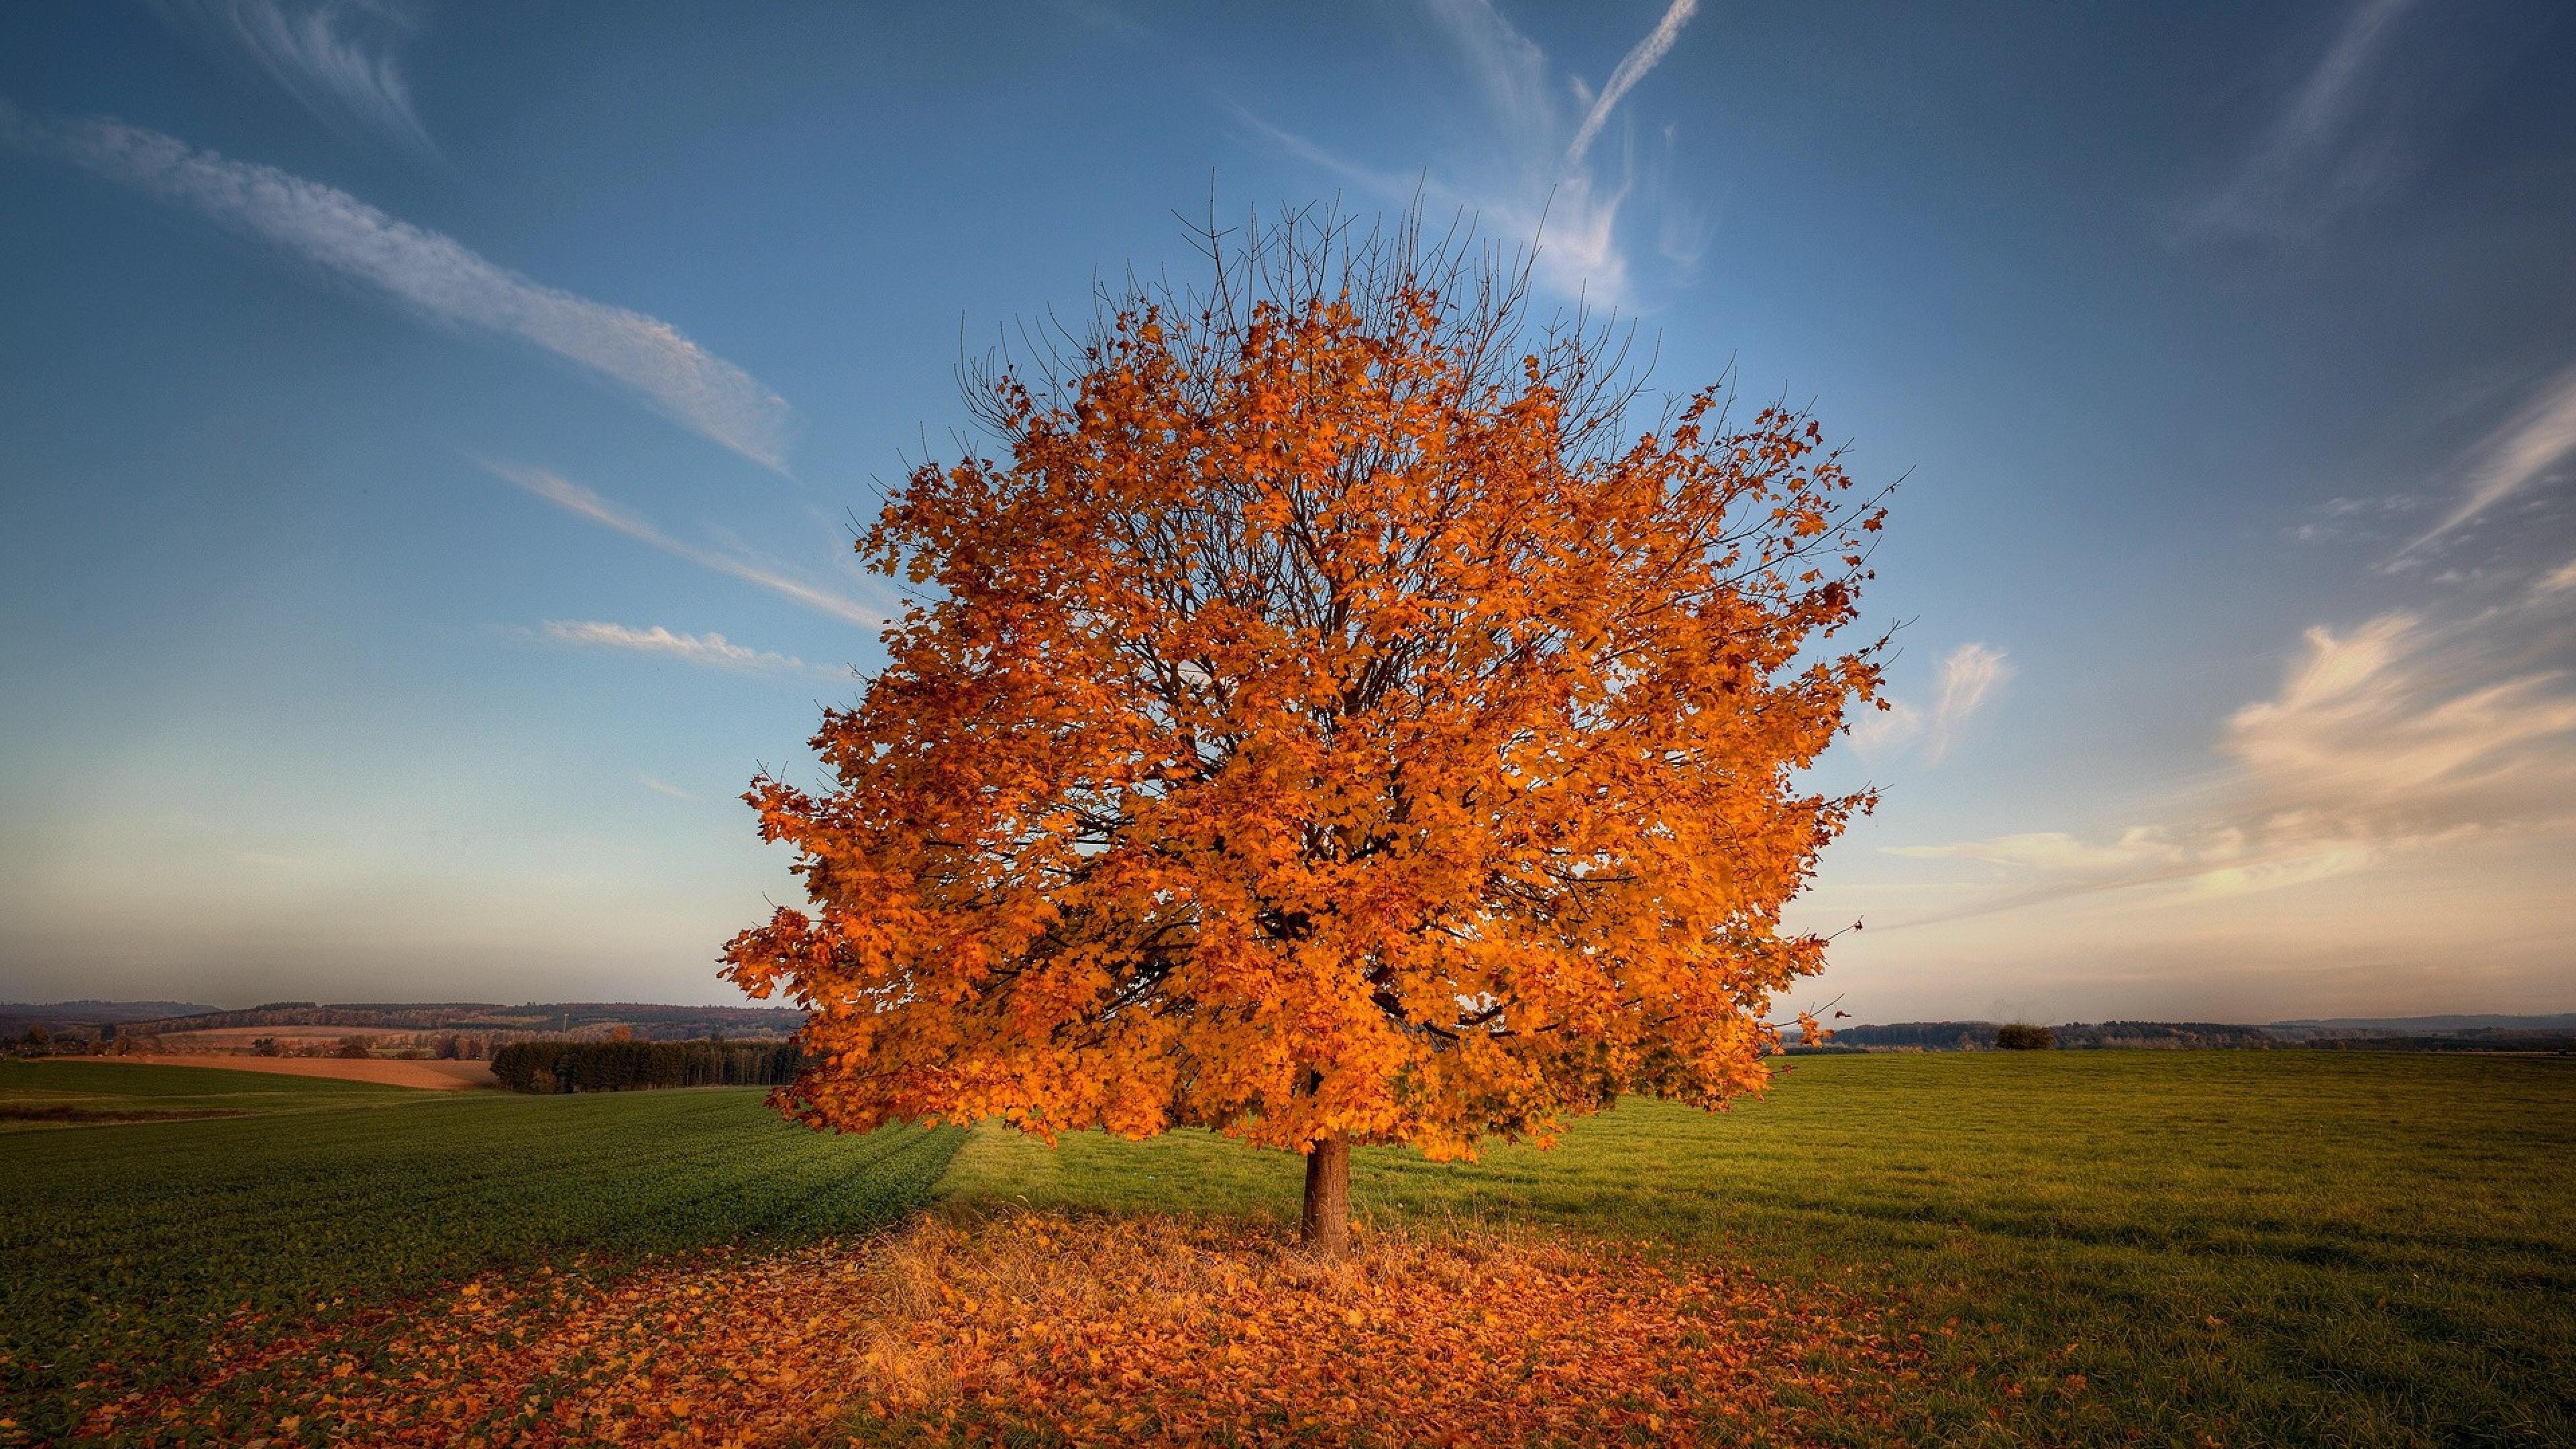 tree autumn field 1535923247 - Tree Autumn Field - trees wallpapers, nature wallpapers, field wallpapers, autumn wallpapers